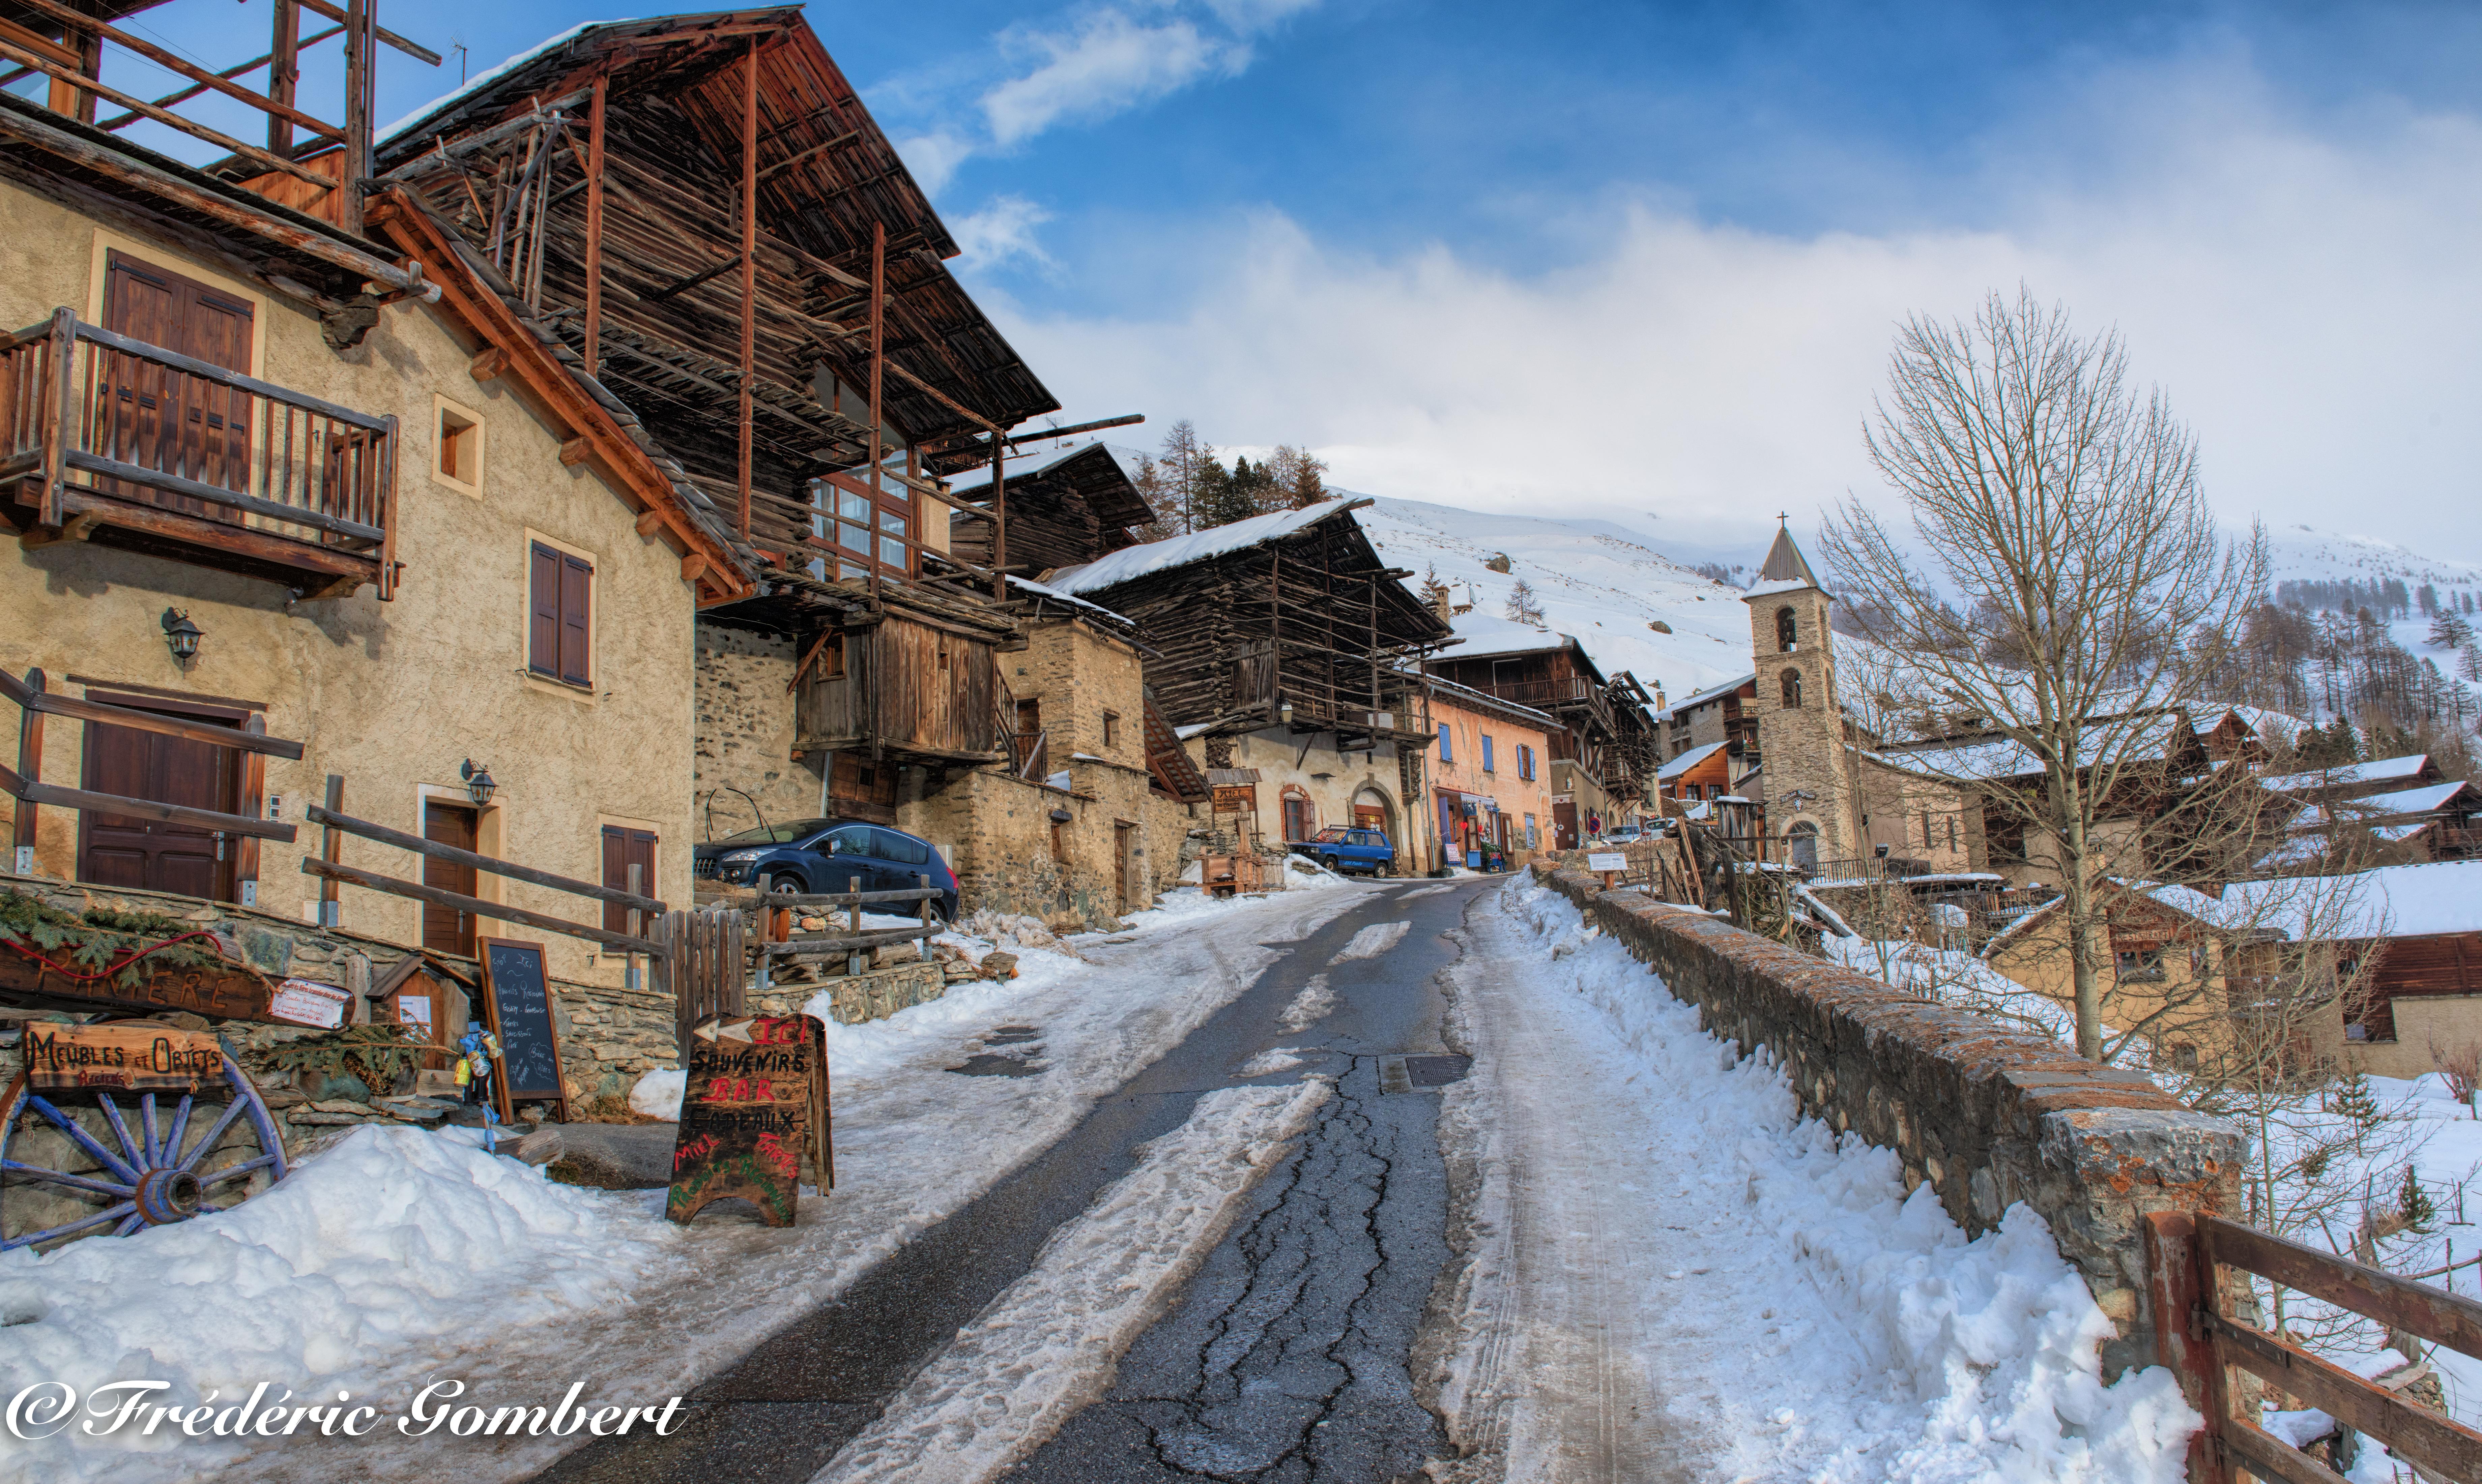 Wallpaper Alp Alpes City Cityscape Snow Street Old Images, Photos, Reviews